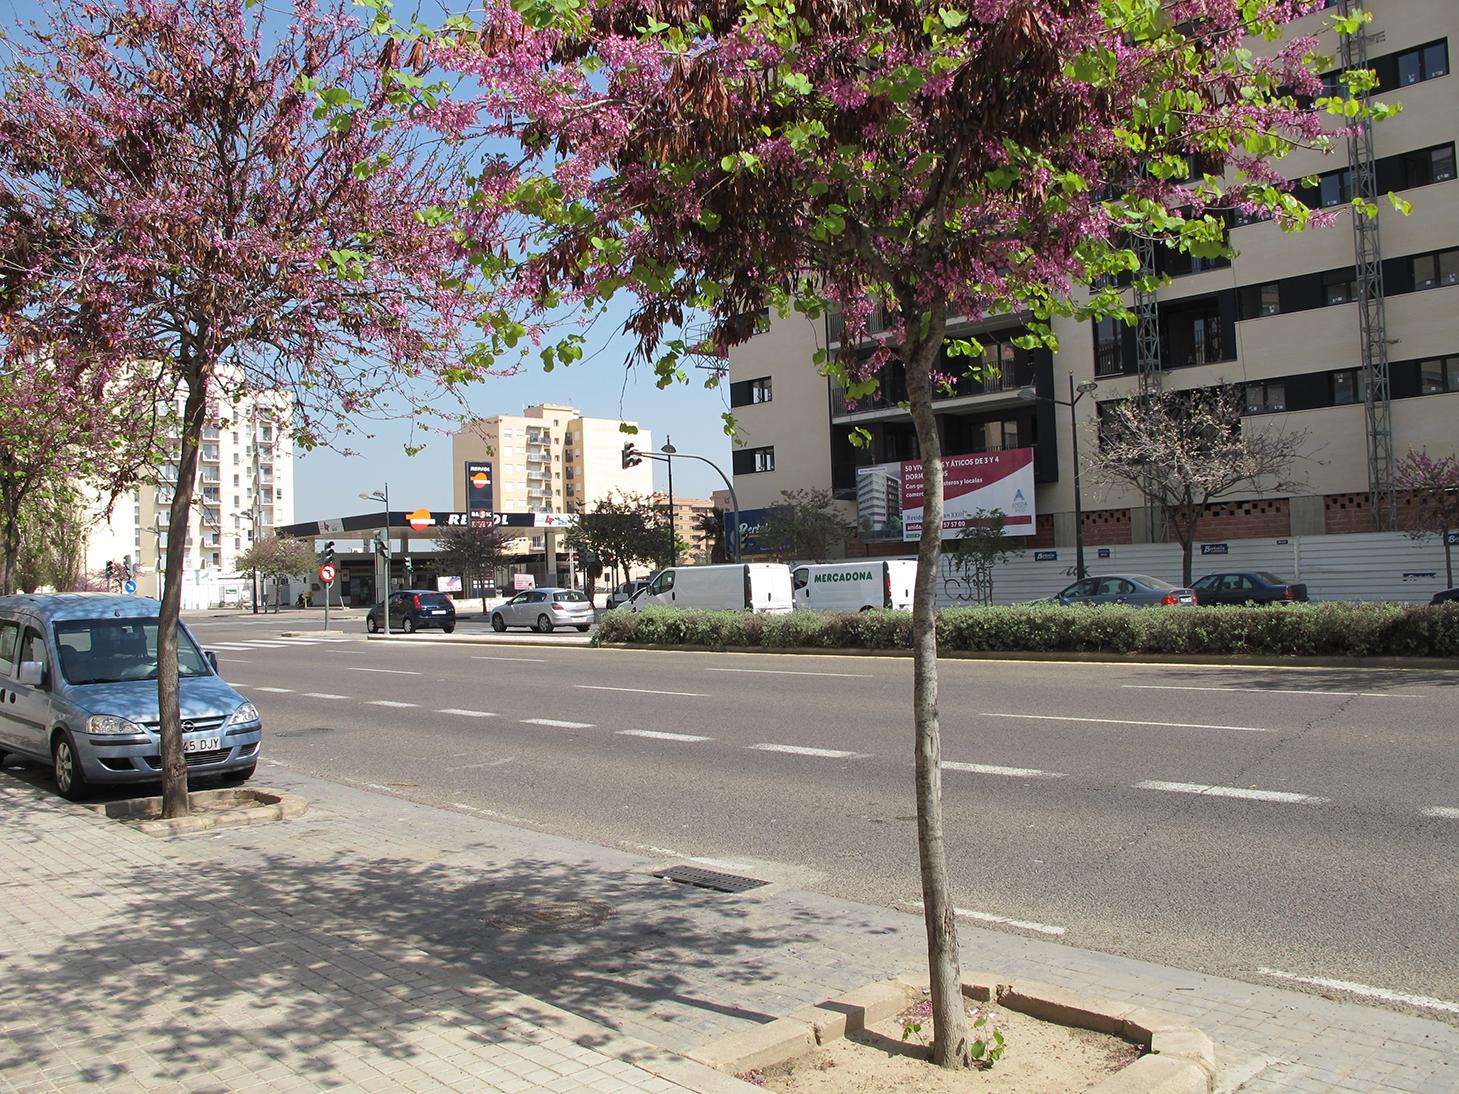 #Benicalap #Valencia #JuanXXIII #Avenidas #Ciudad #Barrio #VivirEnValencia